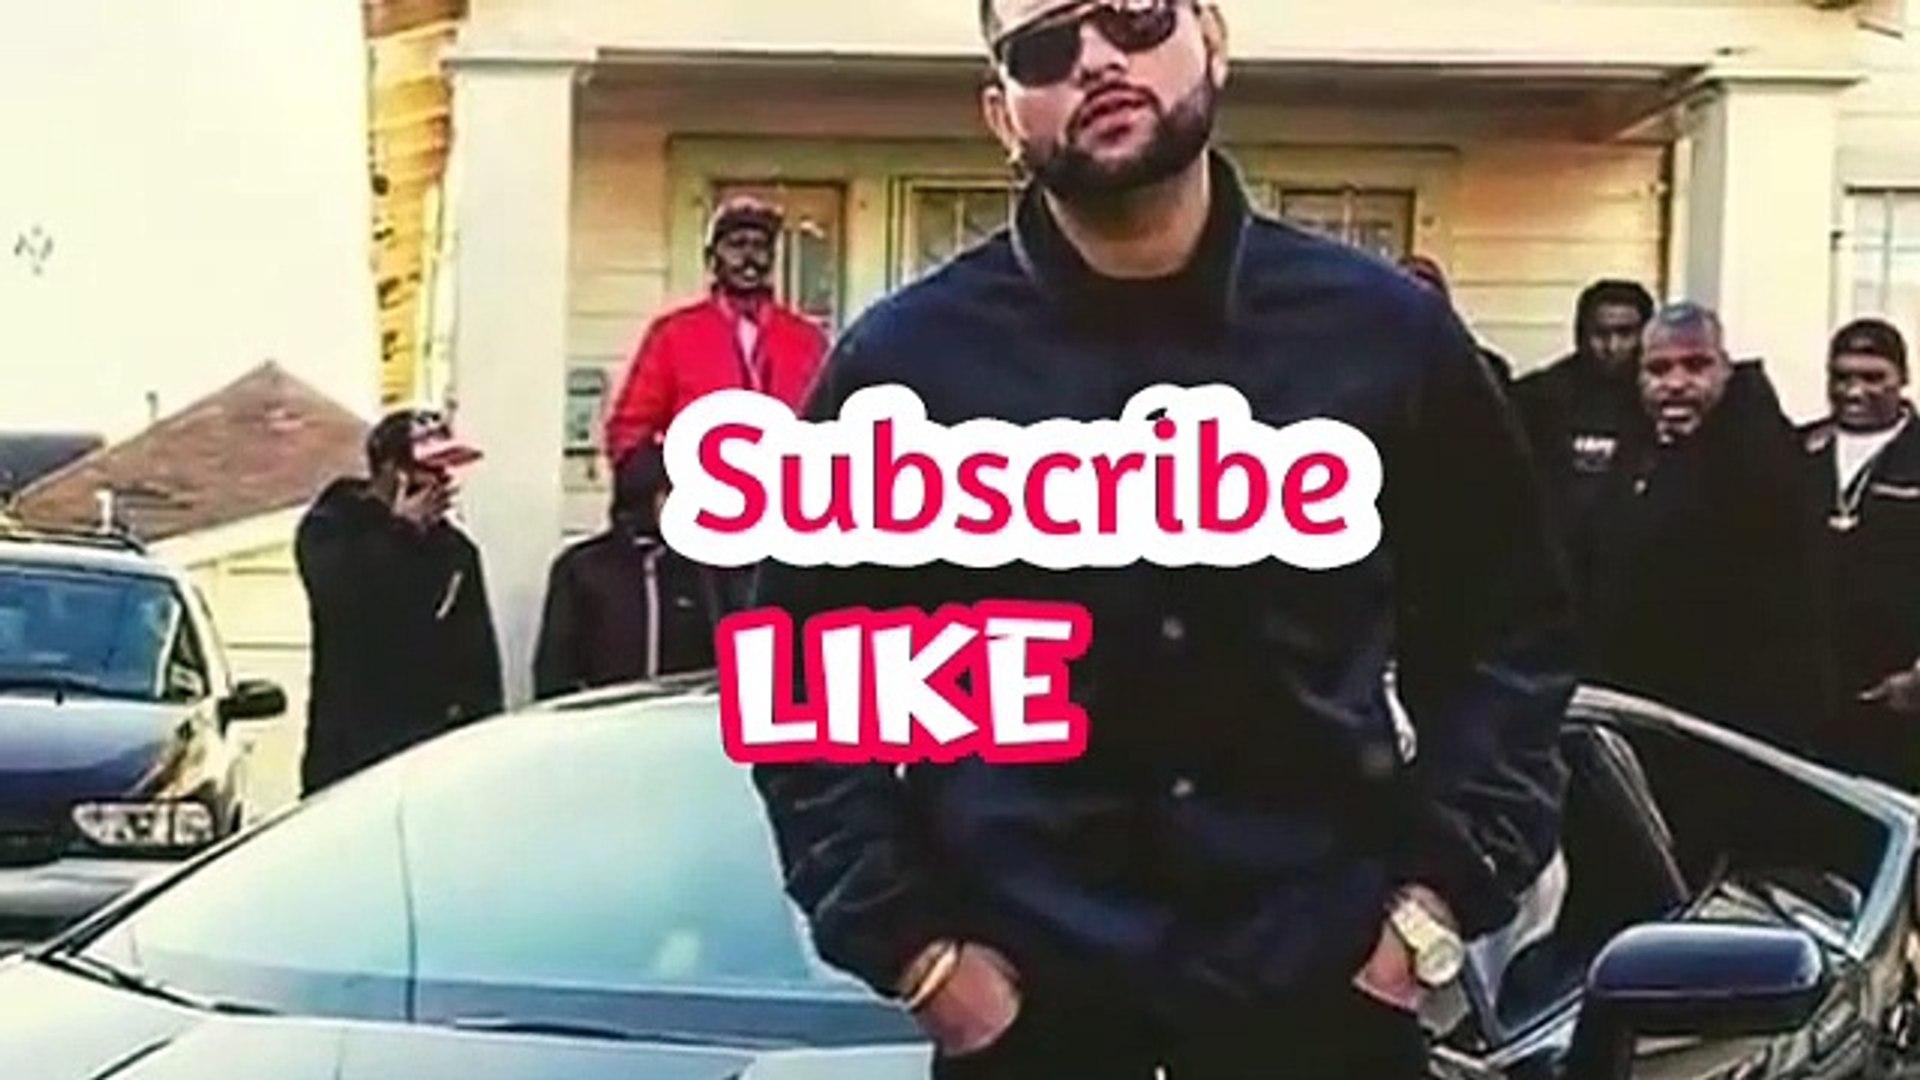 Karan aujla shayari videos   latest punjabi songs 2020   new punjabi songs 2020  